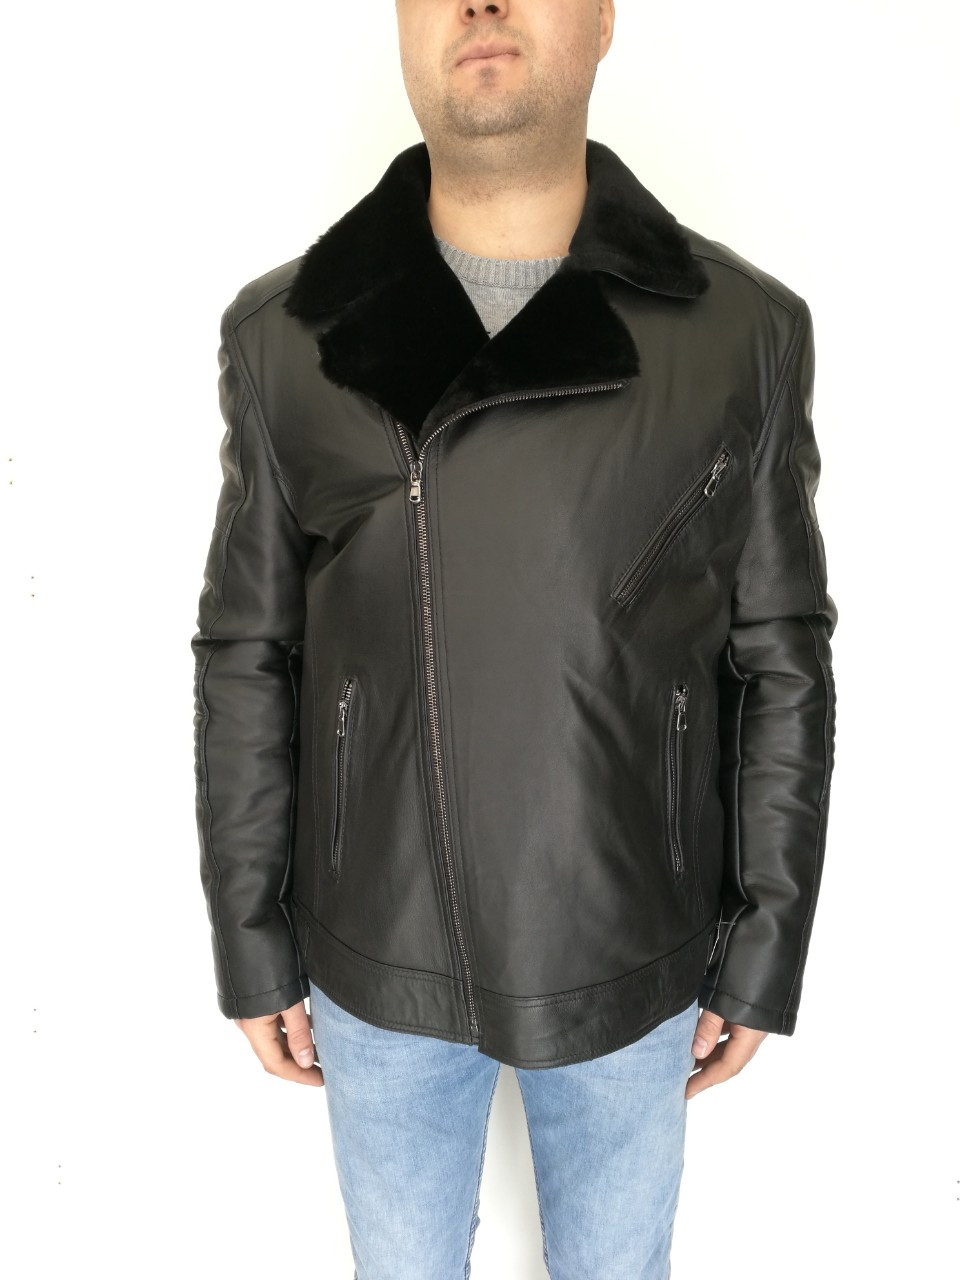 Дубленка мужская косуха /  sheepskin coat for men 370